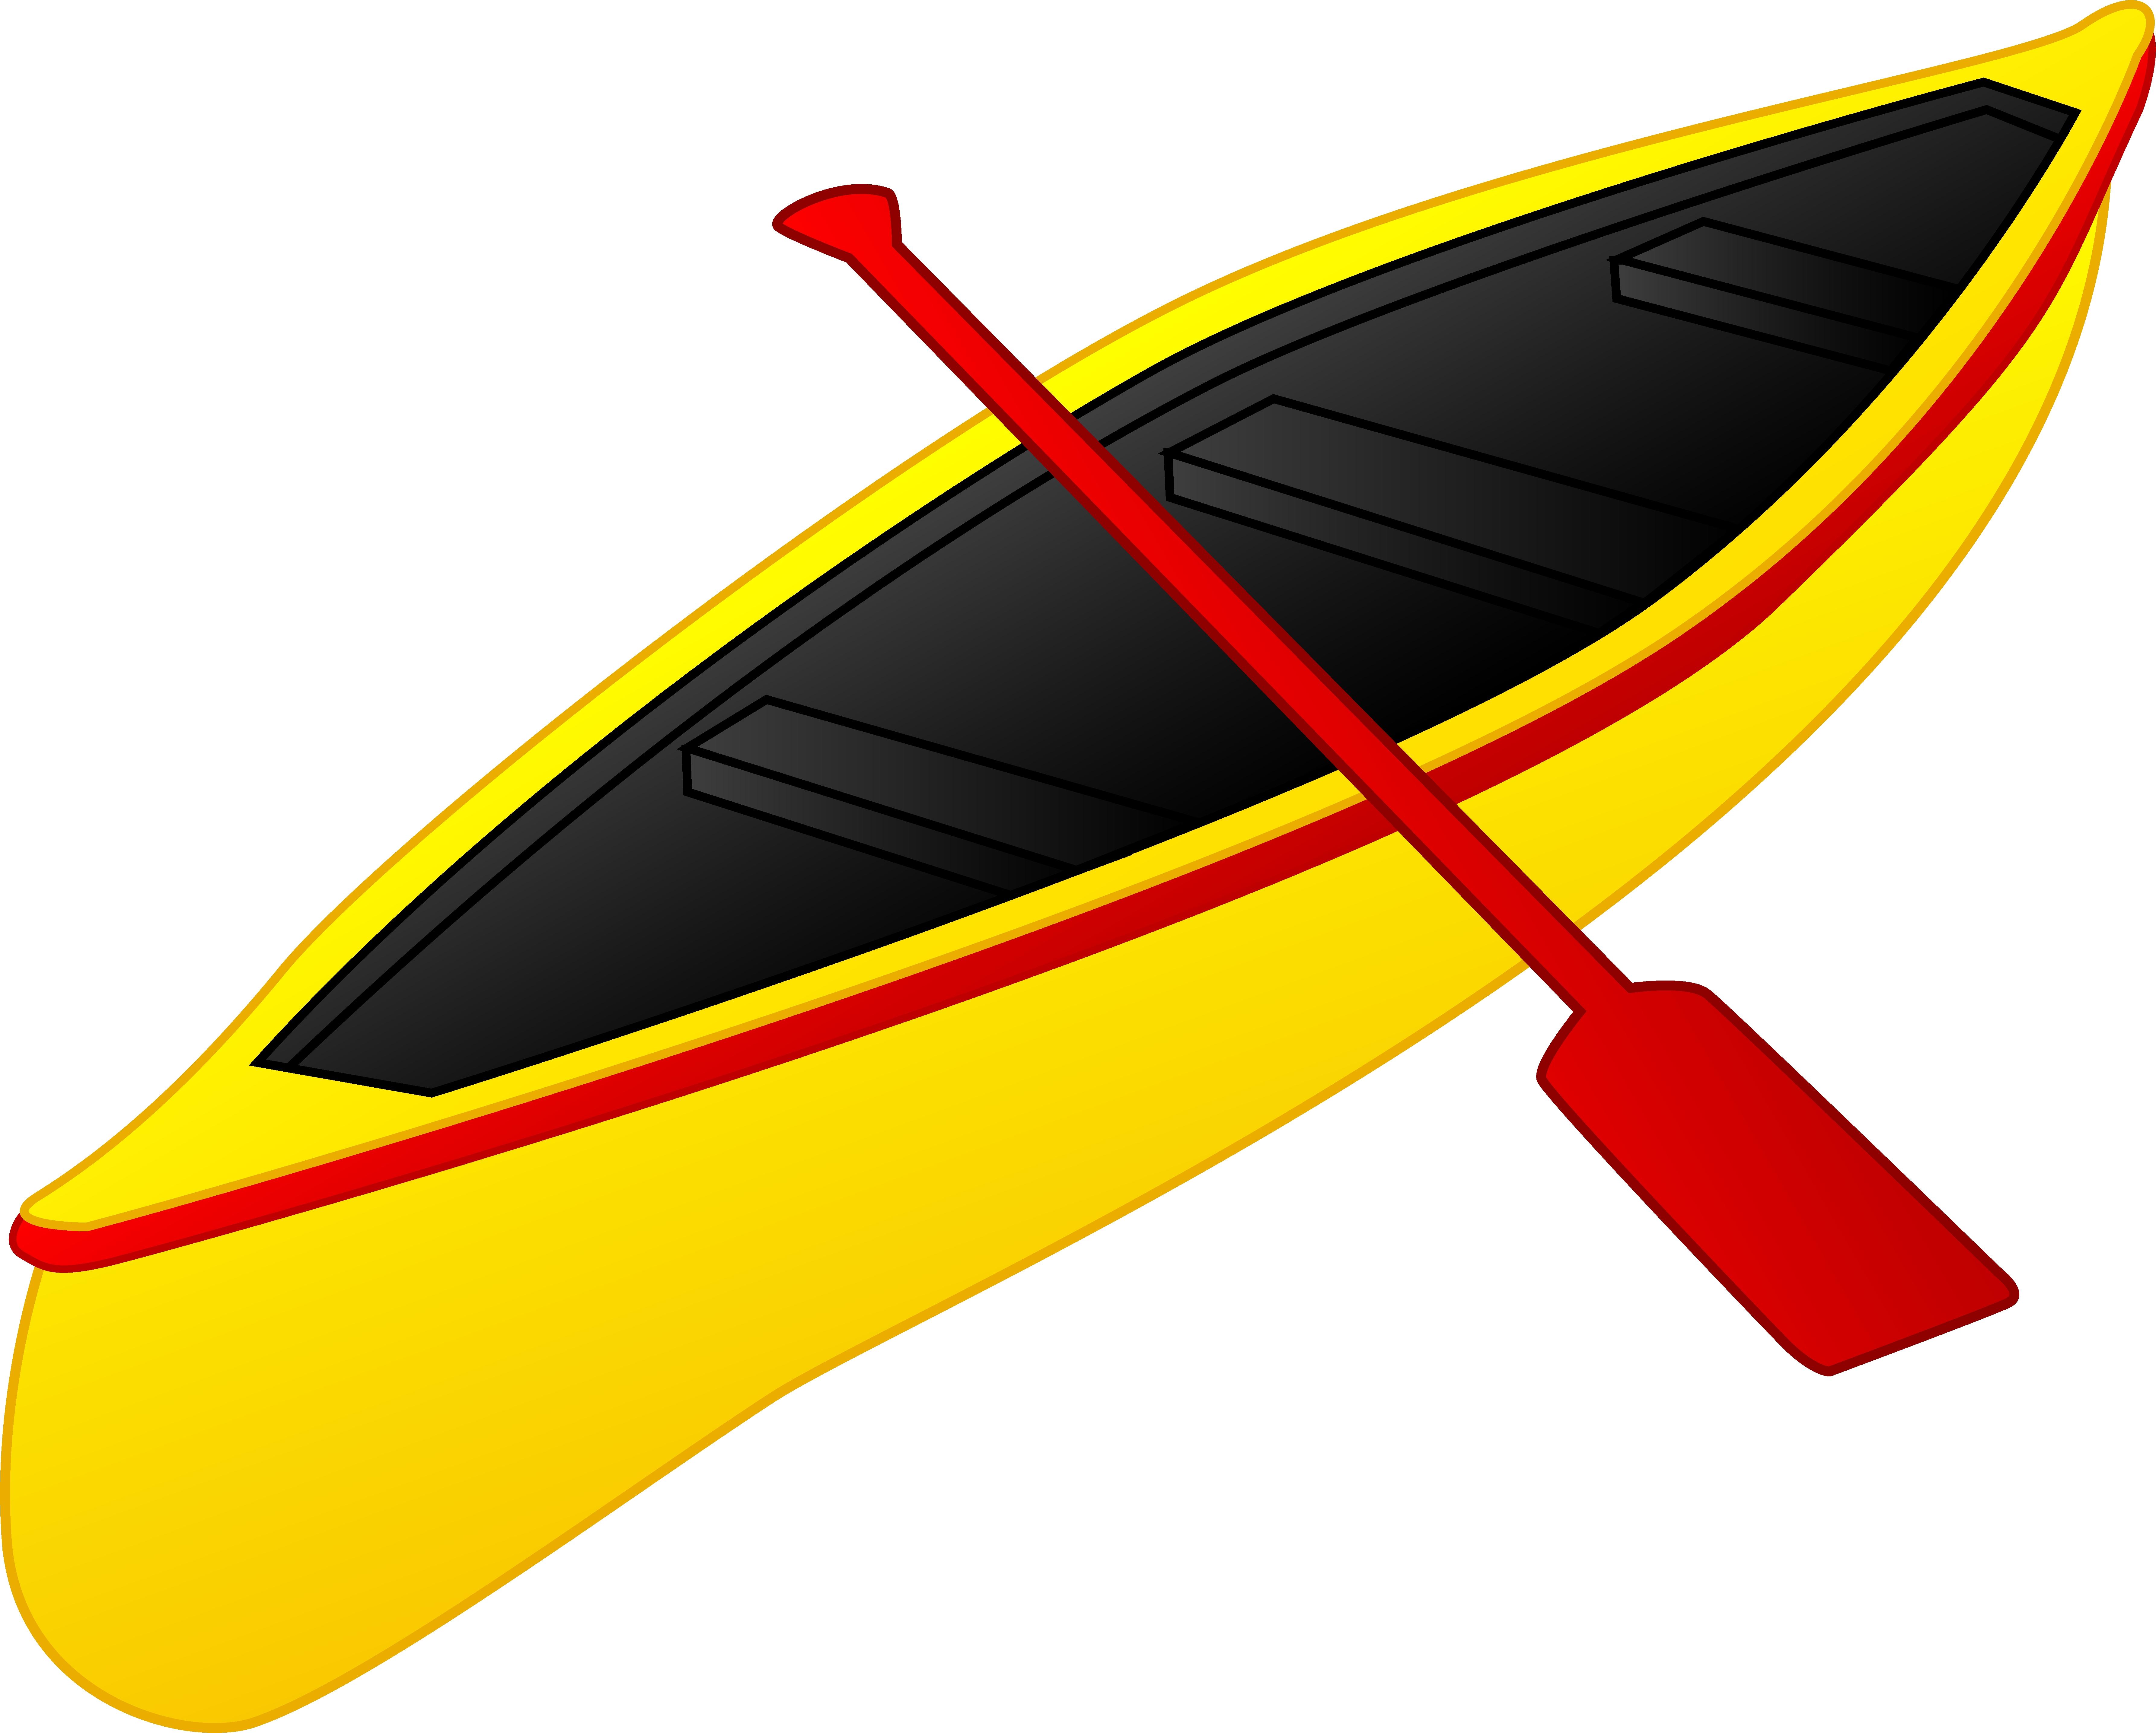 New kayak gallery digital. Canoe clipart